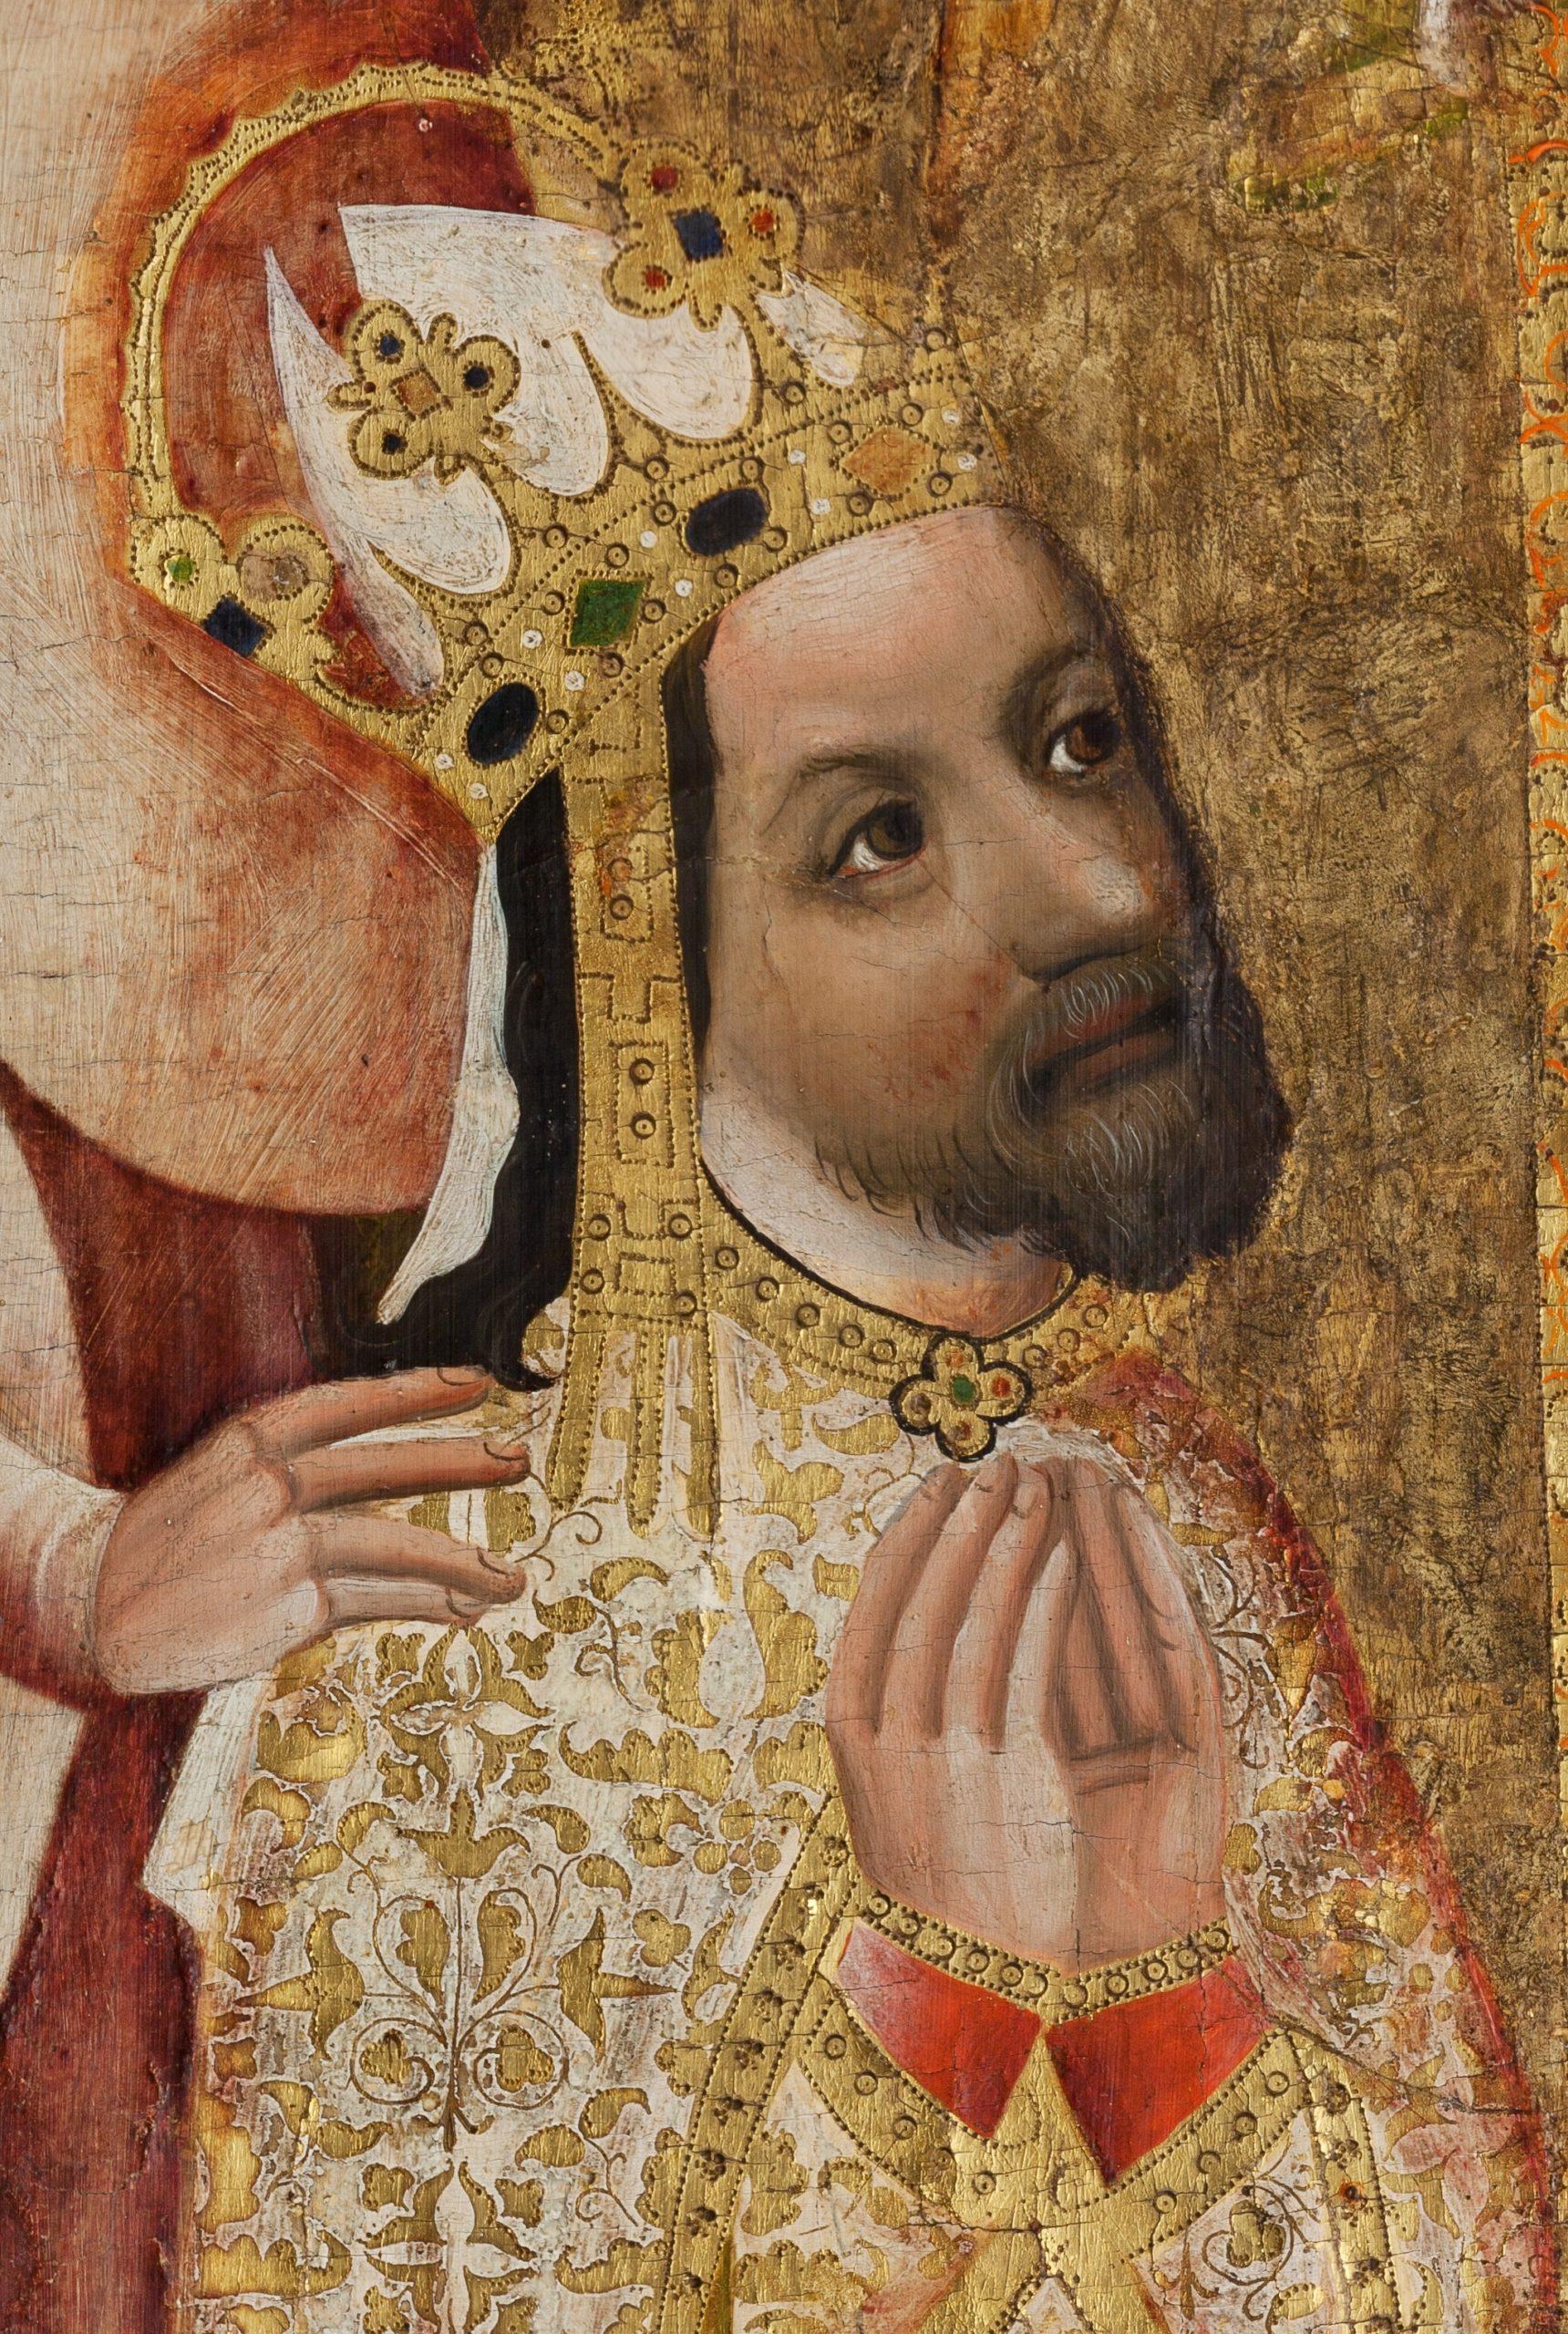 Charles_IV-John_Ocko_votive_picture-fragment